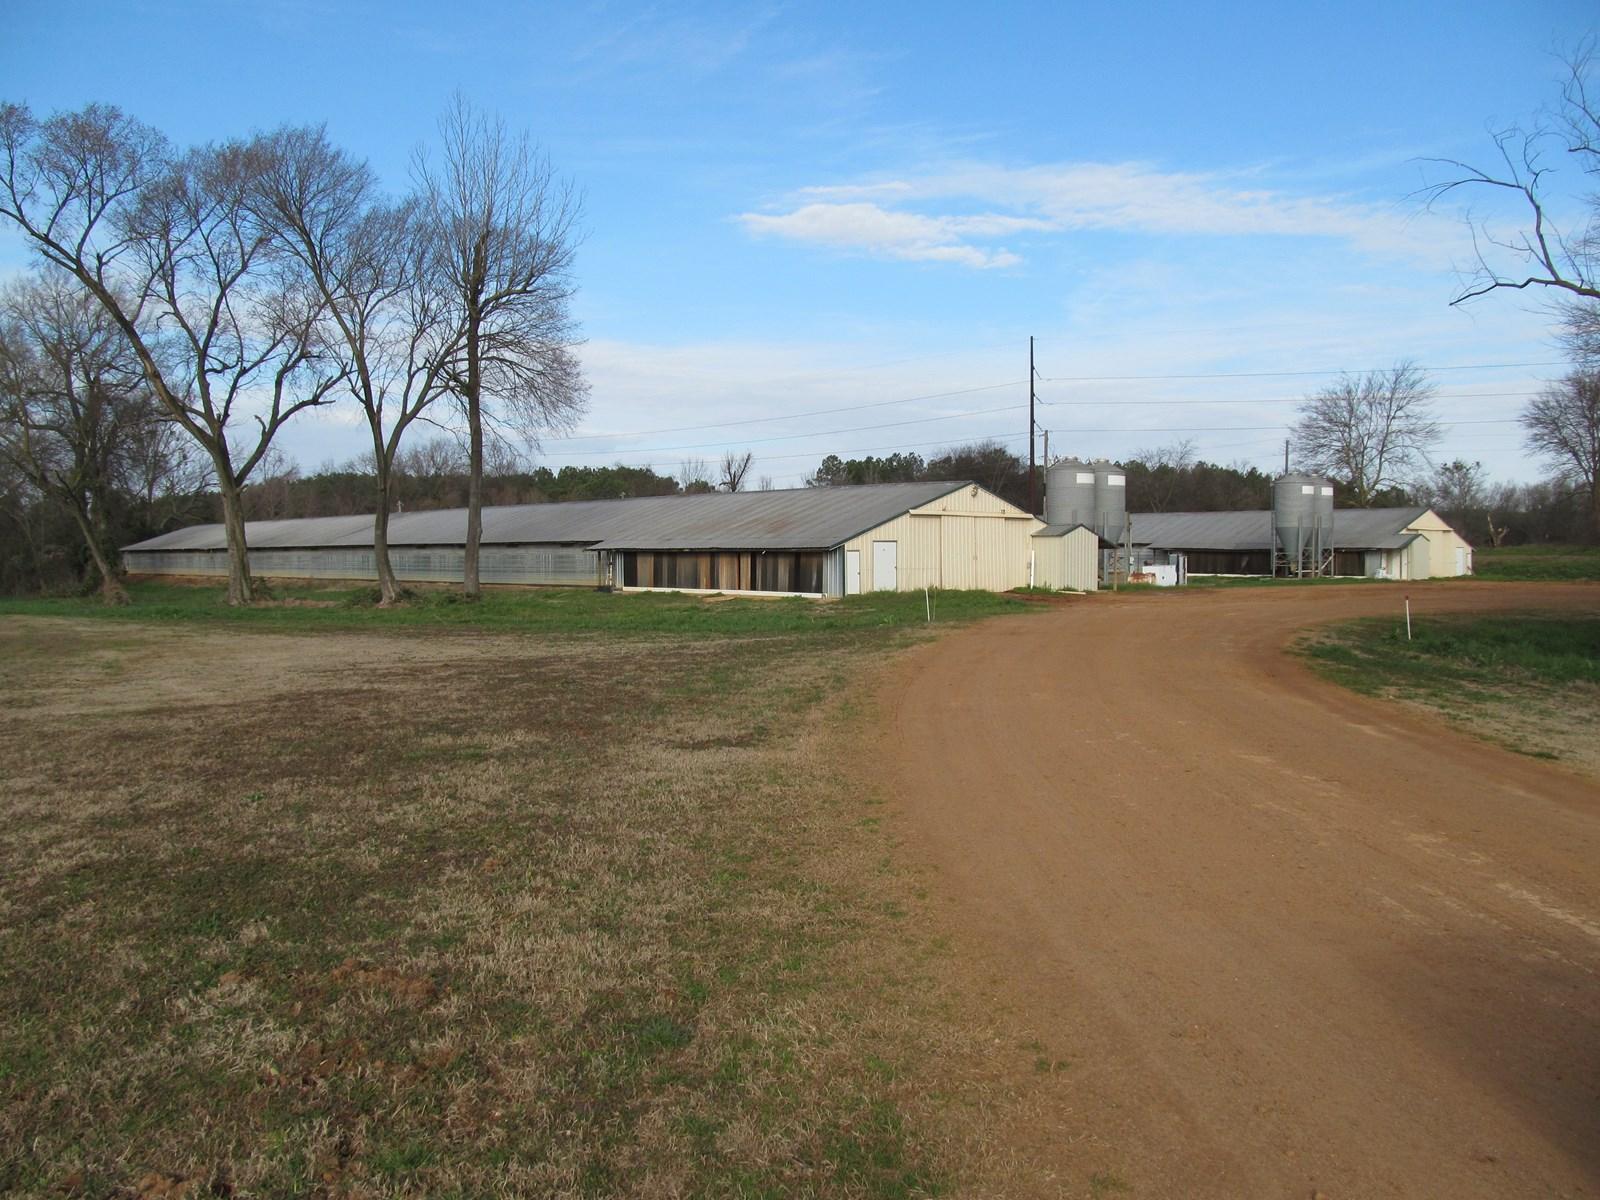 37.5 ACRES PITTSBURG, TEXAS - 12 HOUSE POULTRY FARM